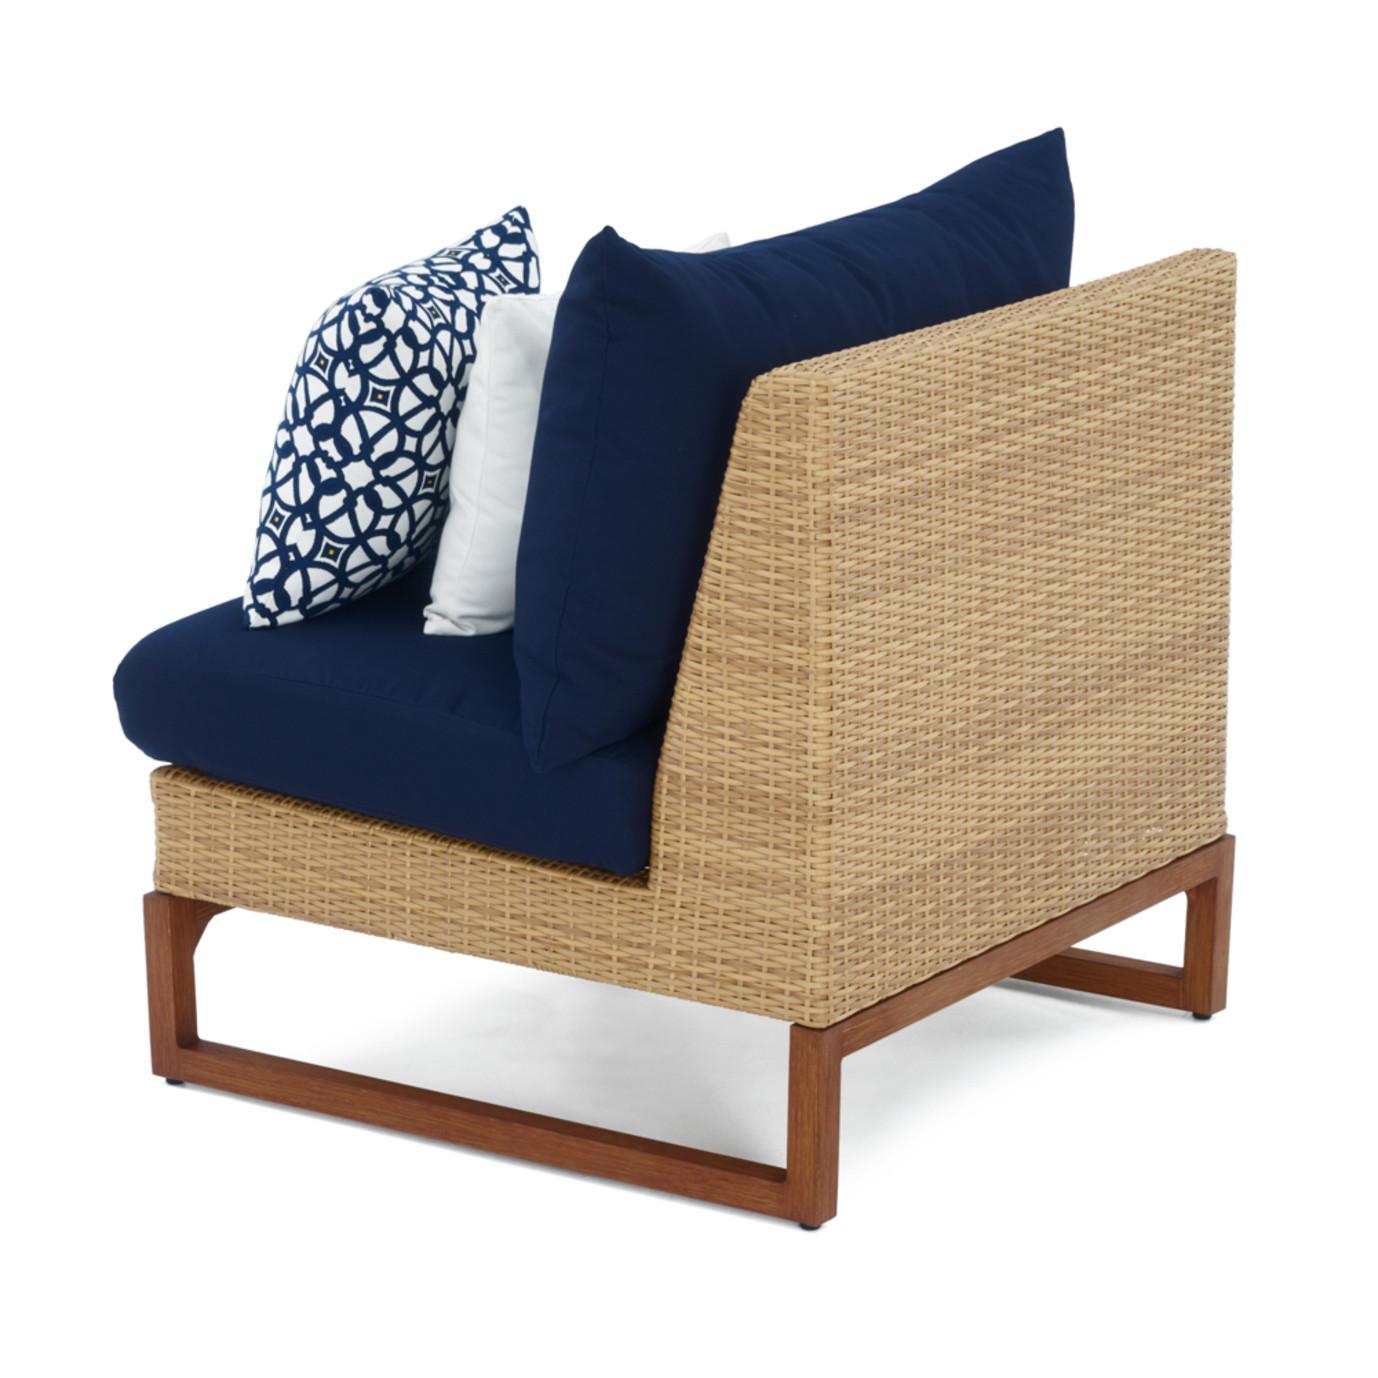 Mili™ 6pc Sofa Sectional - Navy Blue